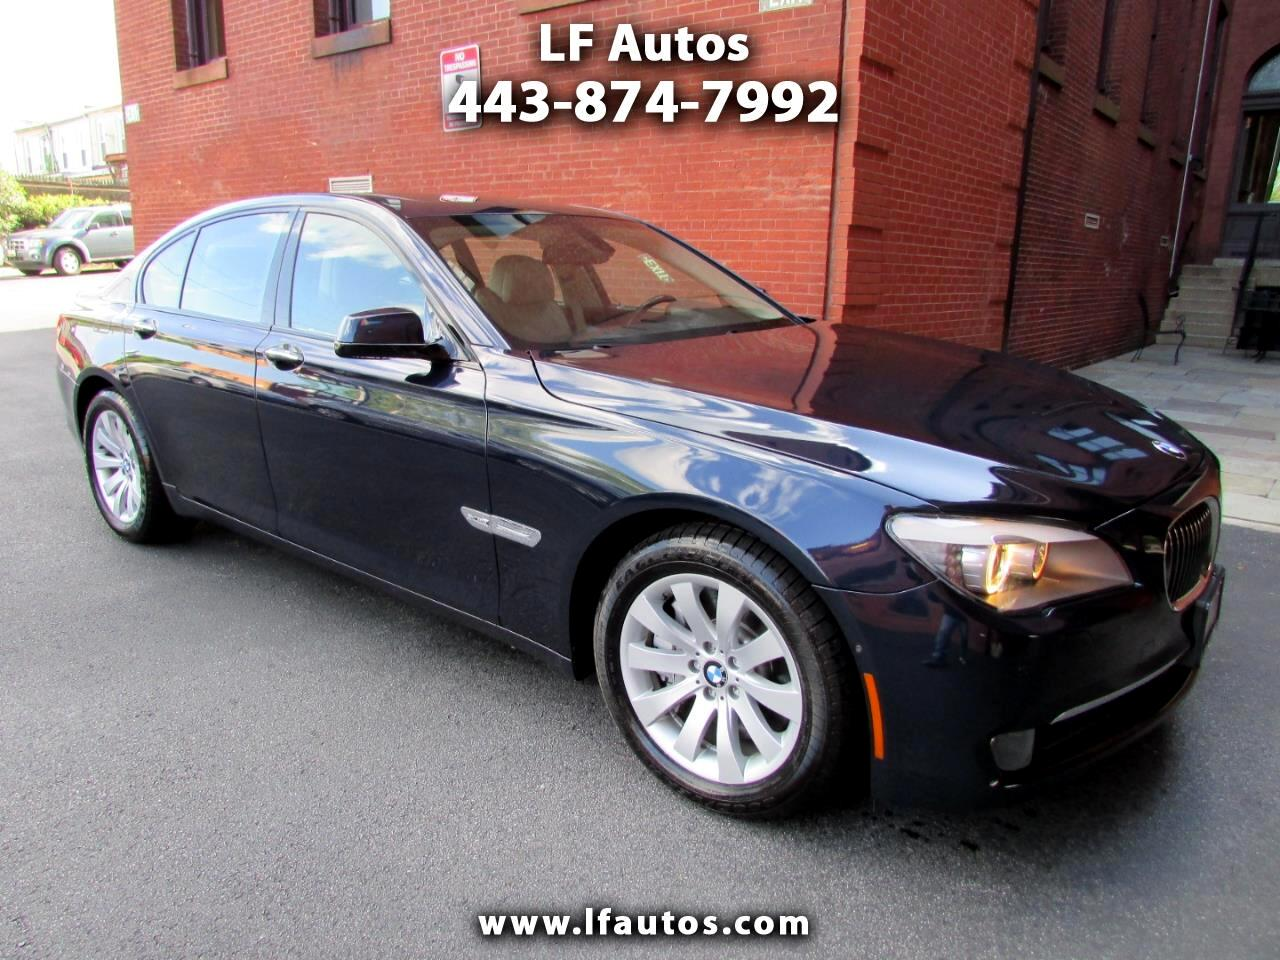 2010 BMW 7 Series 4dr Sdn 750i xDrive AWD